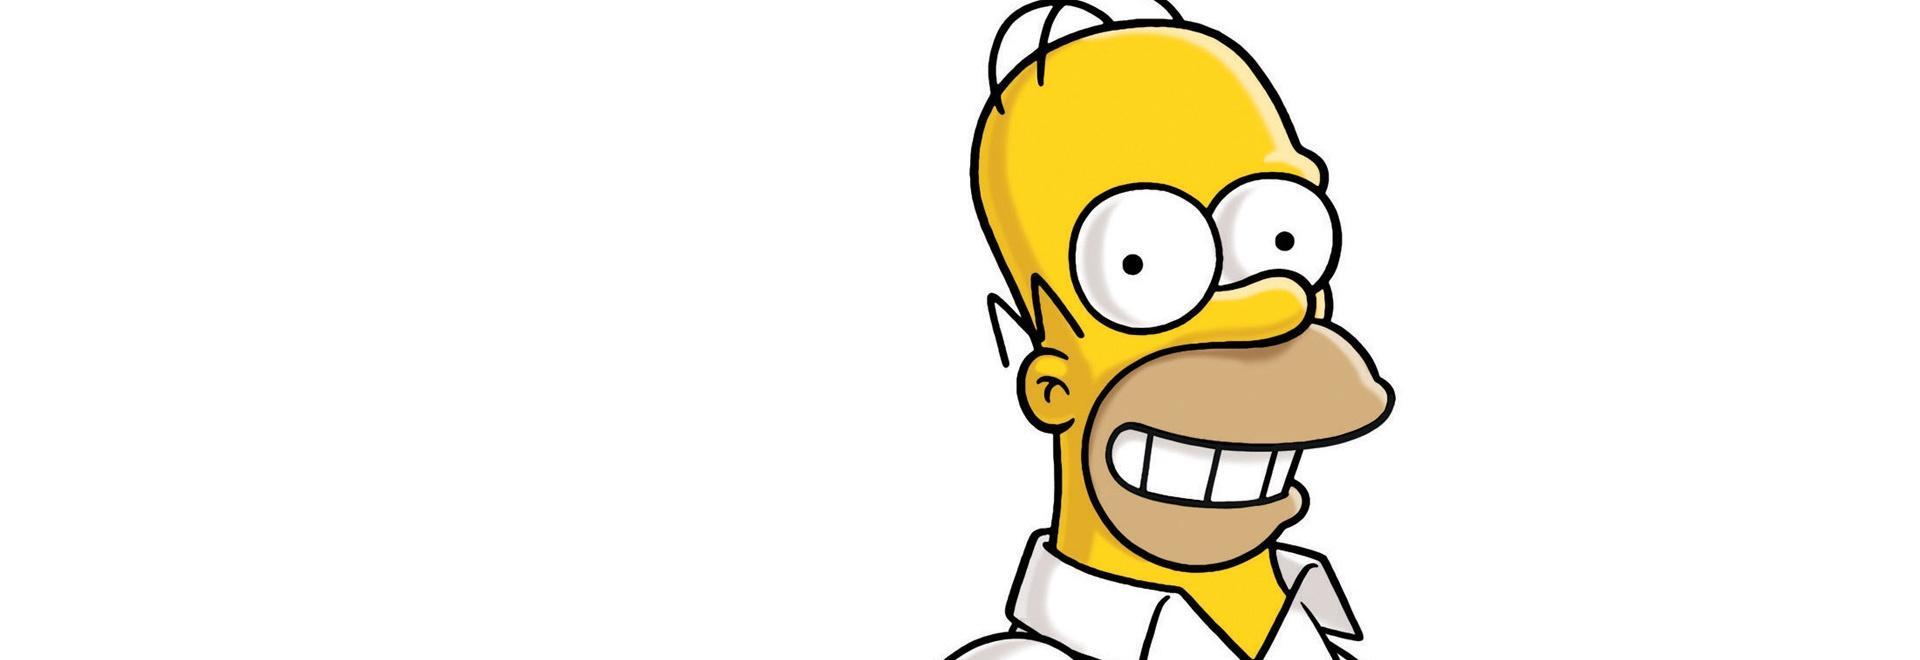 Il triplice bypass di Homer